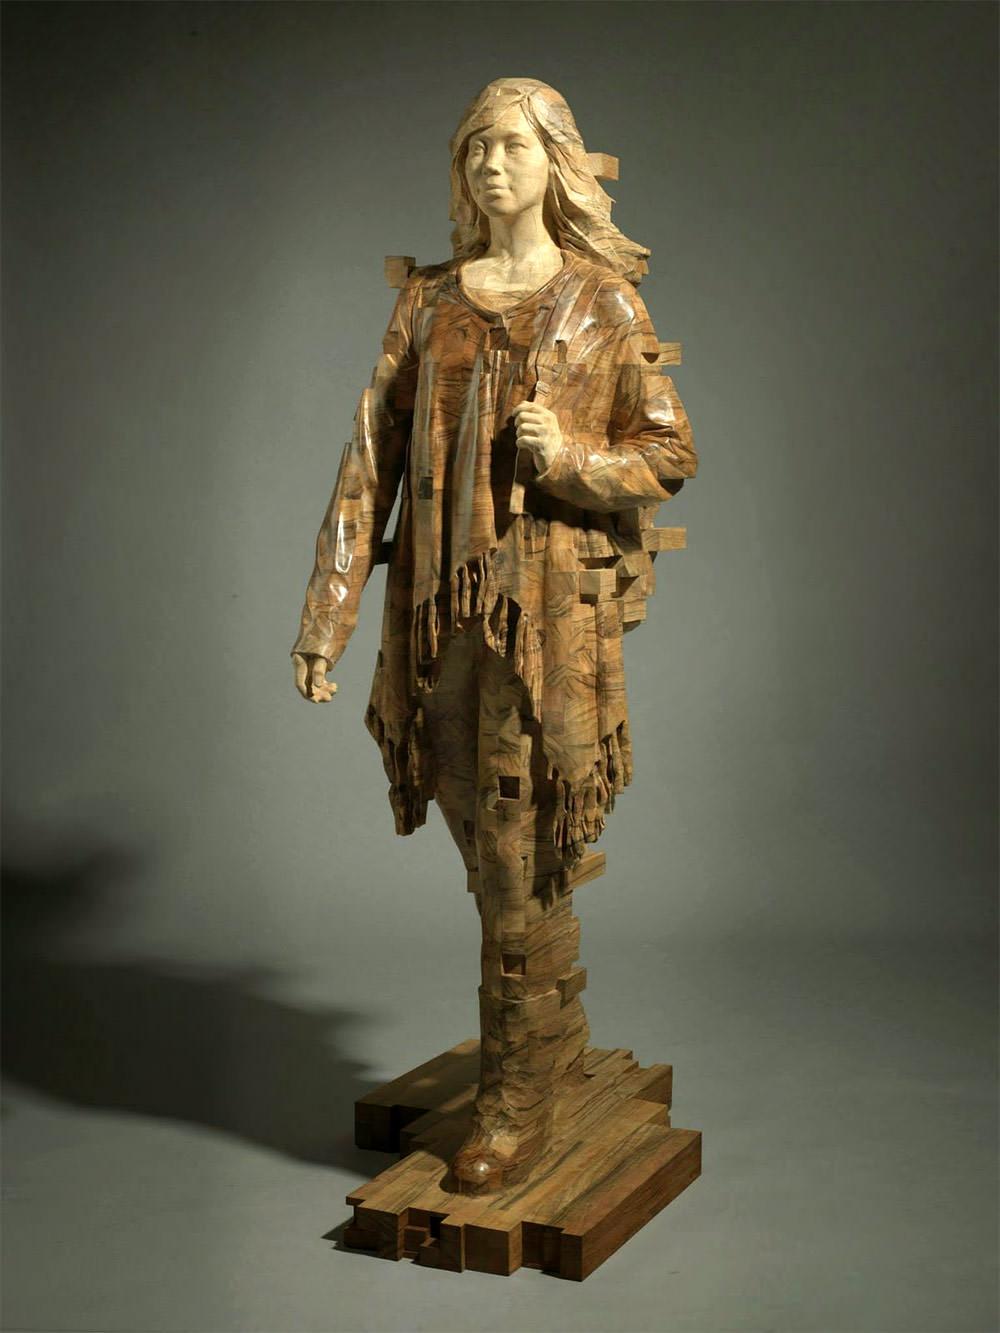 hsu-tung-han-sculture-iperrealiste-legno-con-pixel-01